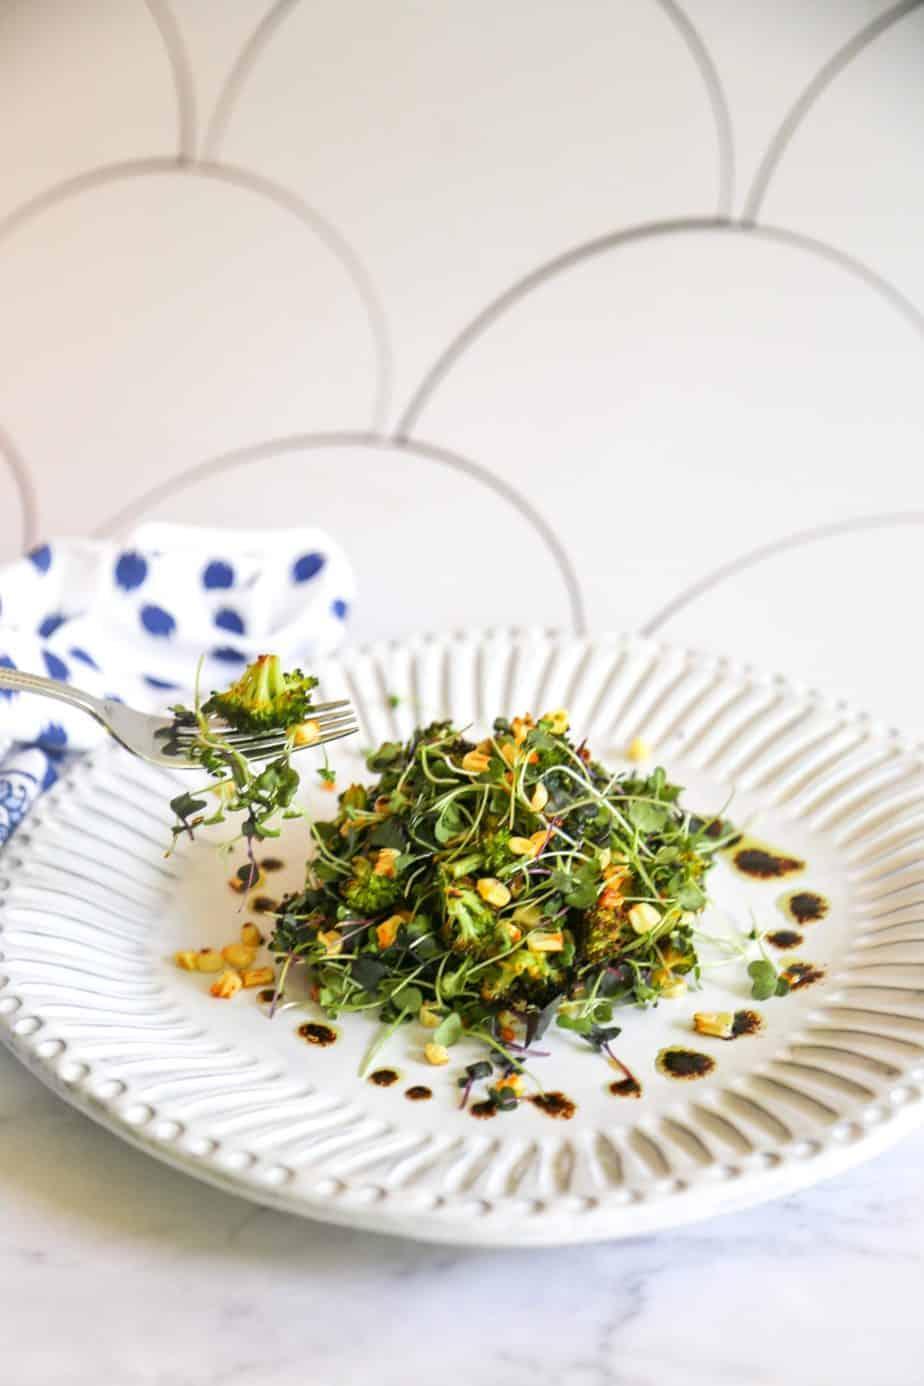 roasted broccoli salad with corn mixed microgreens and balsamic vinaigrette